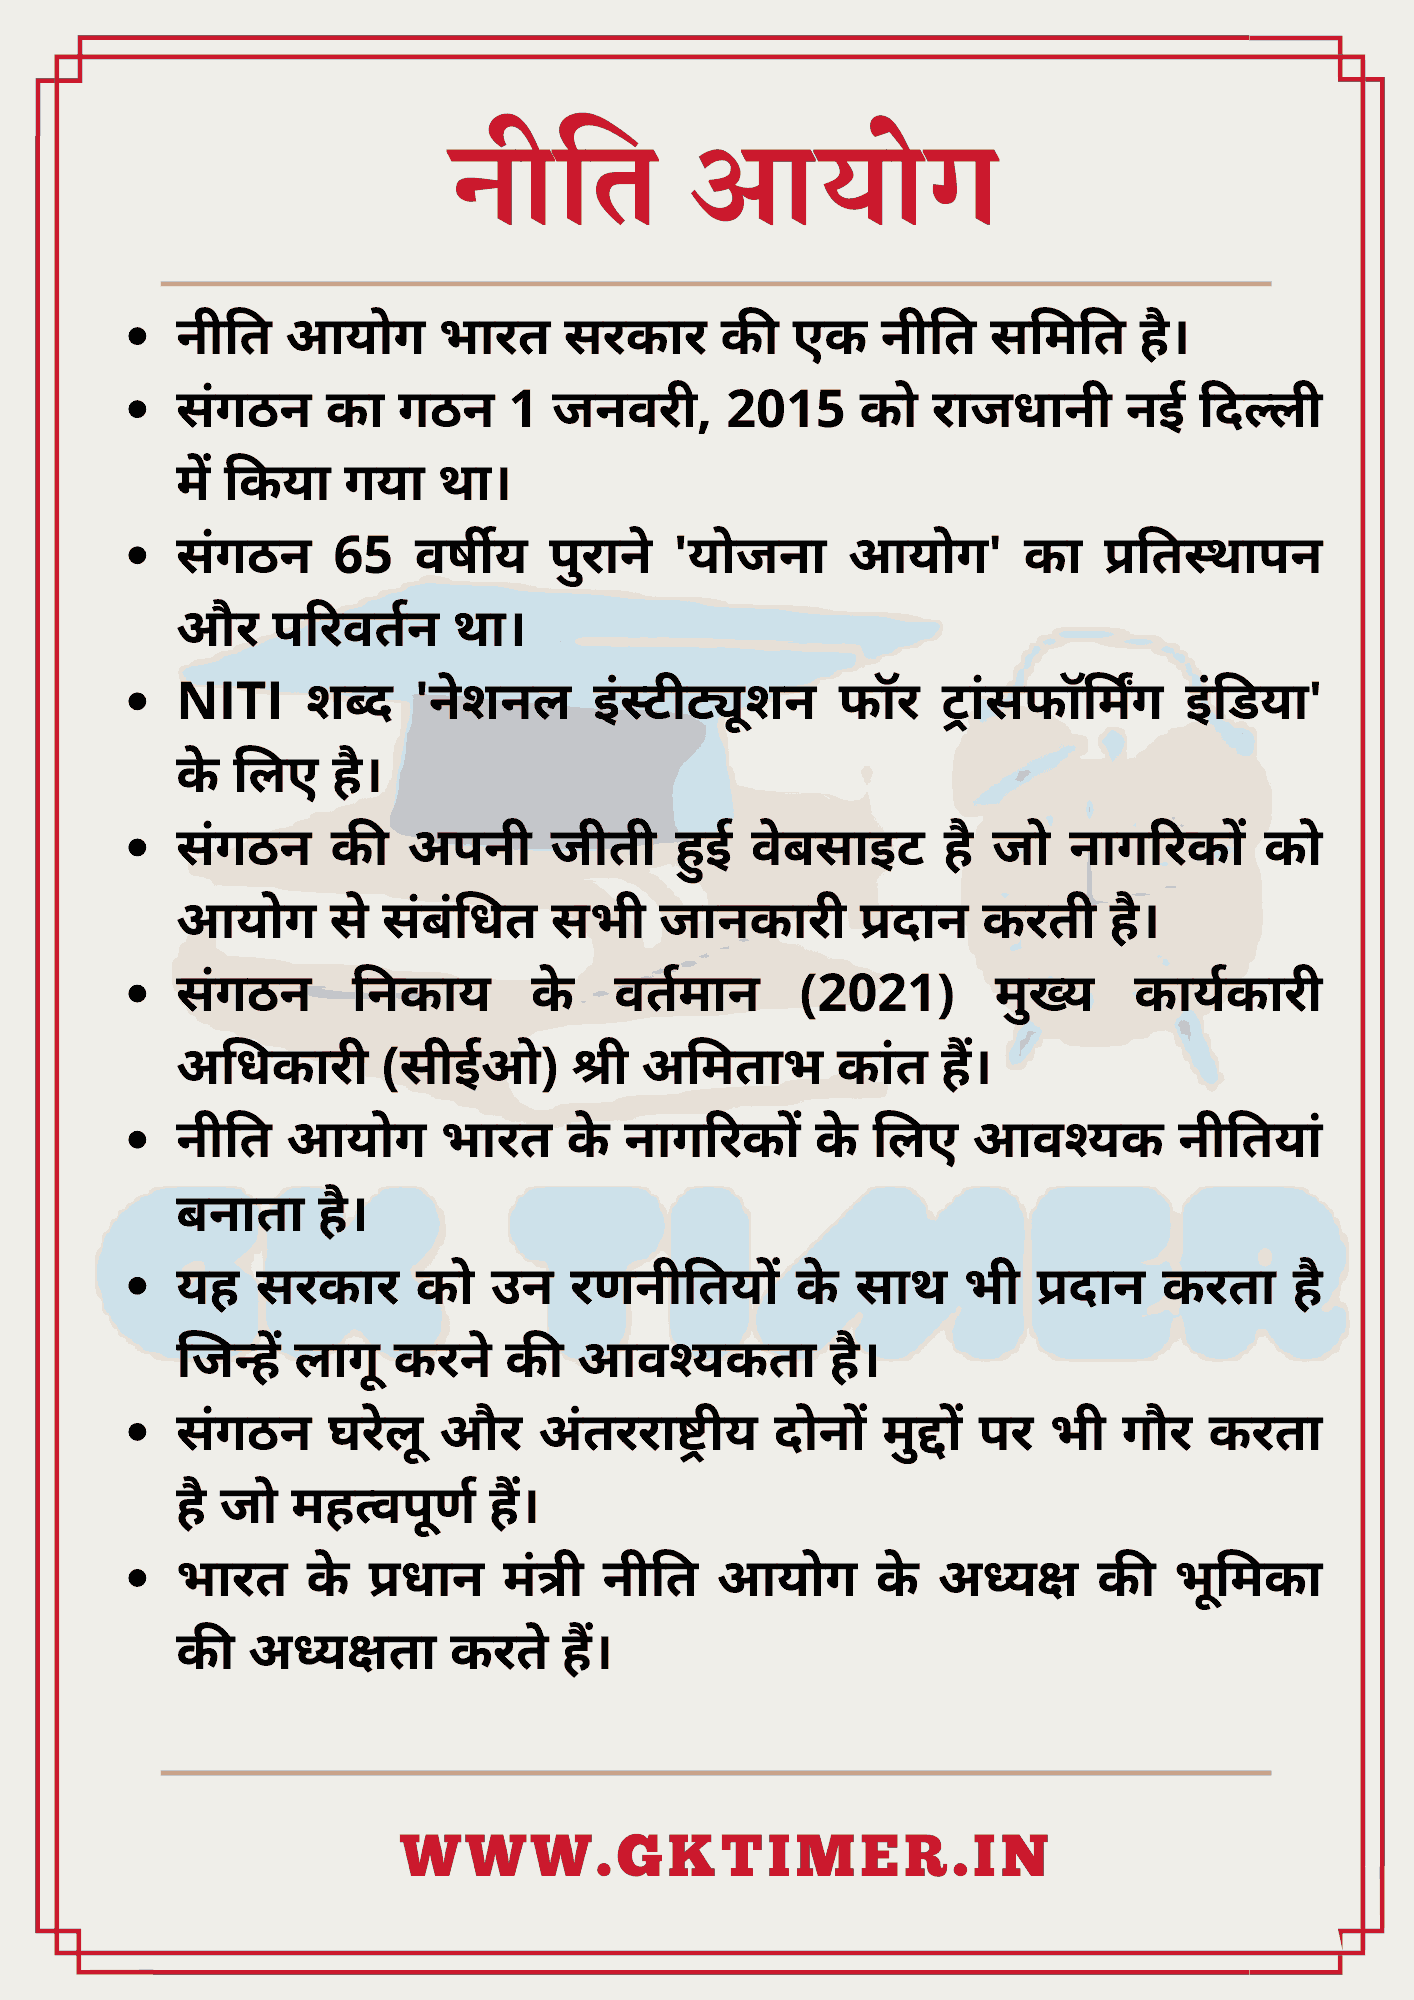 नीति आयोग पर निबंध   Essay on NITI Aayog in Hindi   10 Lines on NITI Aayog in Hindi